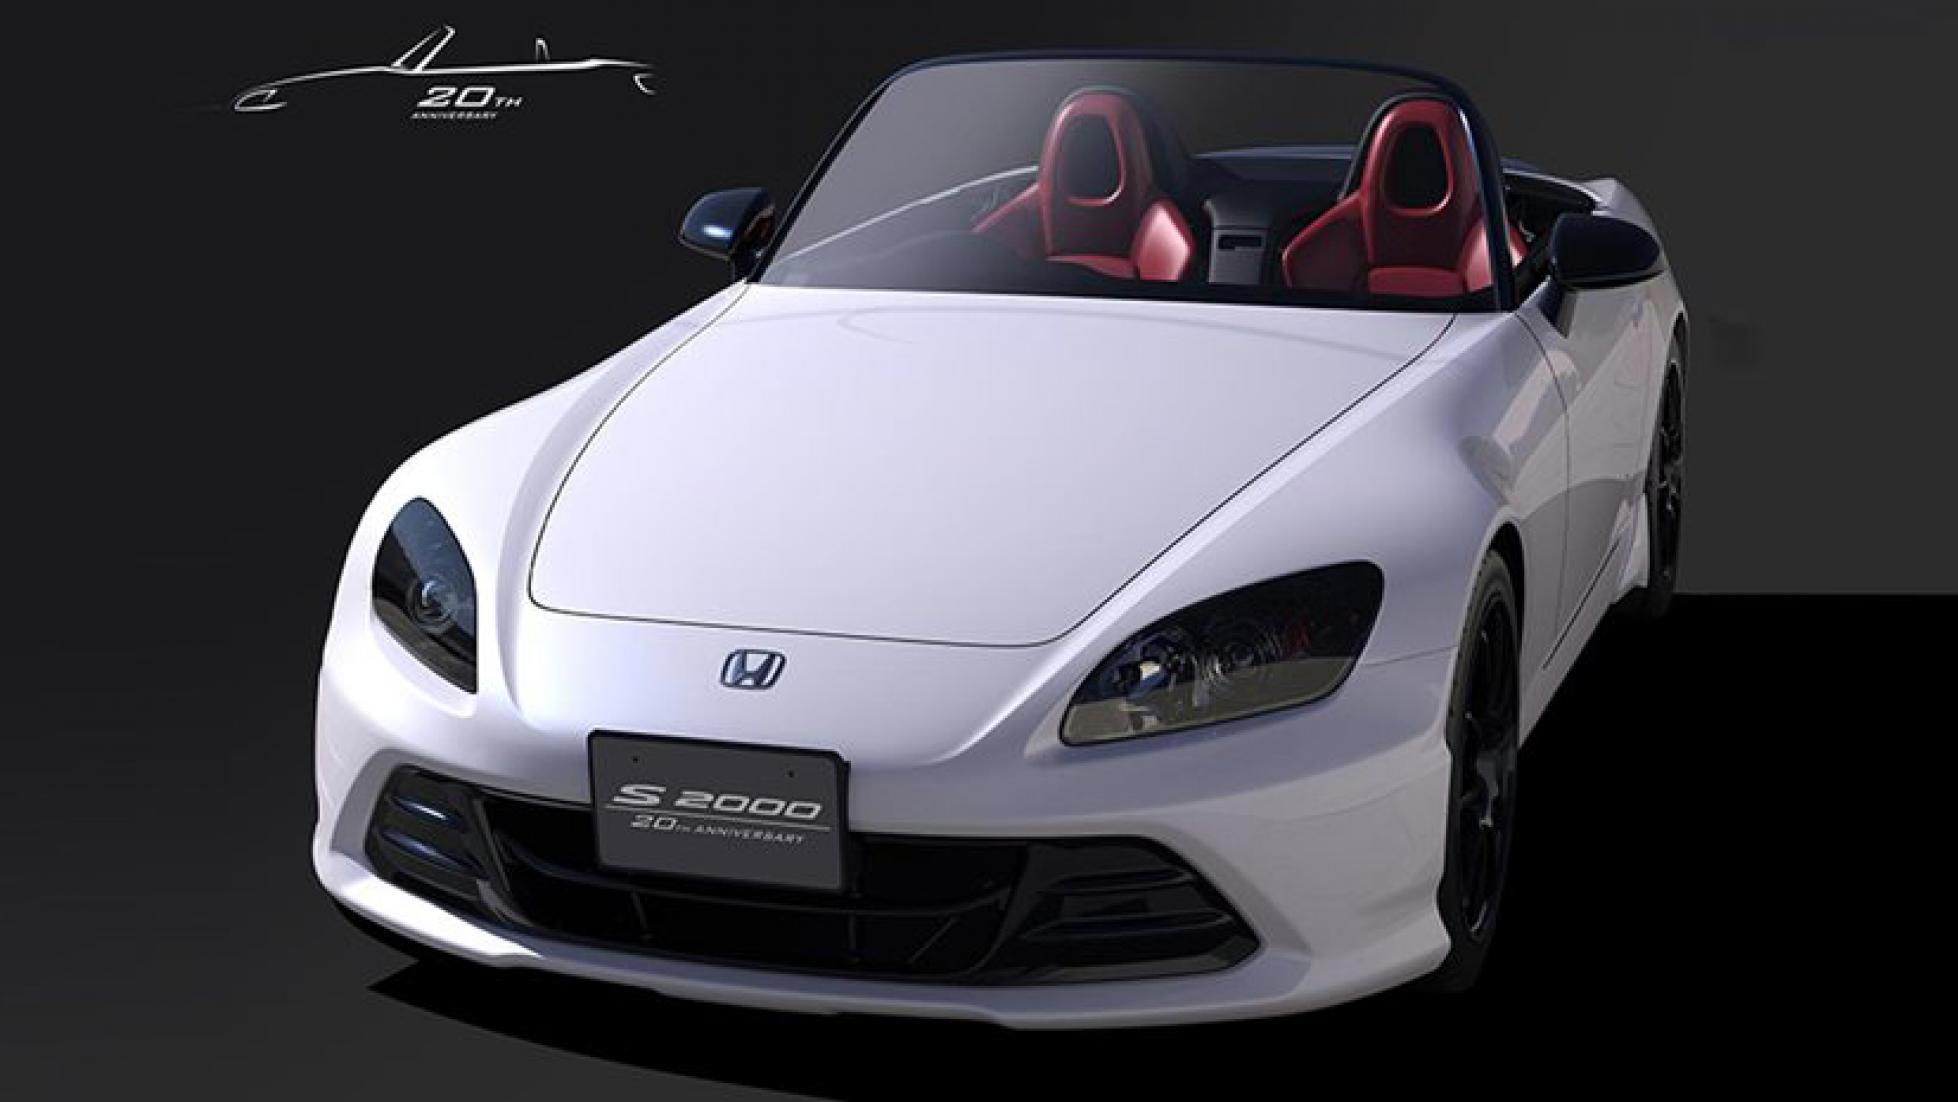 2021 Honda S2000 Redesign